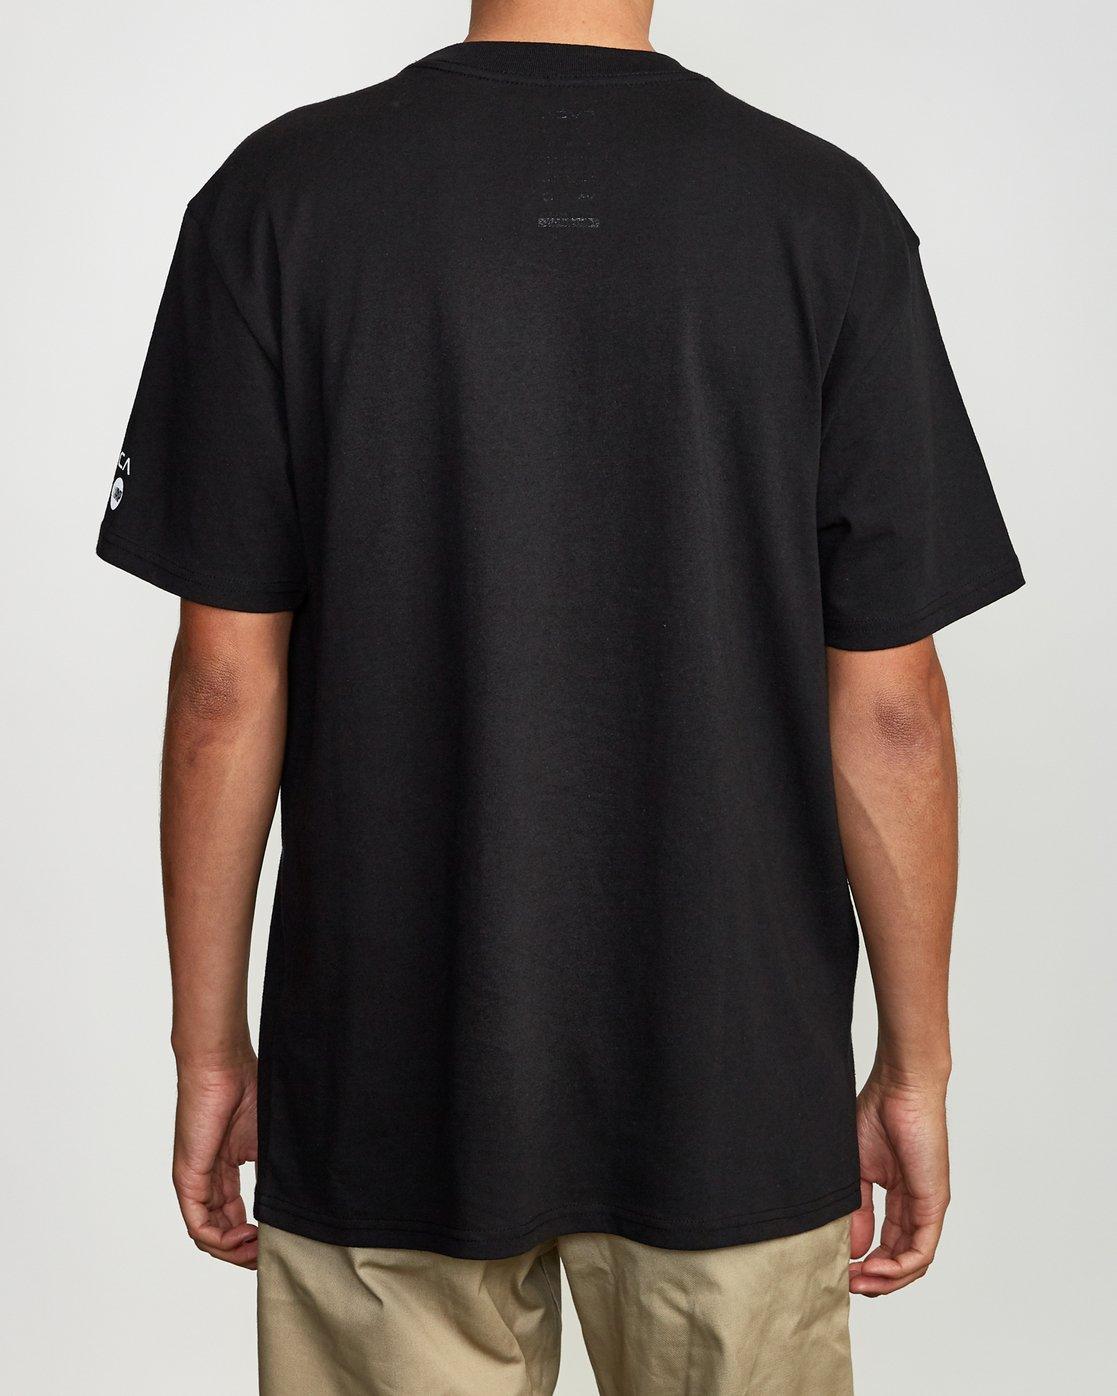 3 Niikuratakao Tokyo T-Shirt Black M410VRNI RVCA